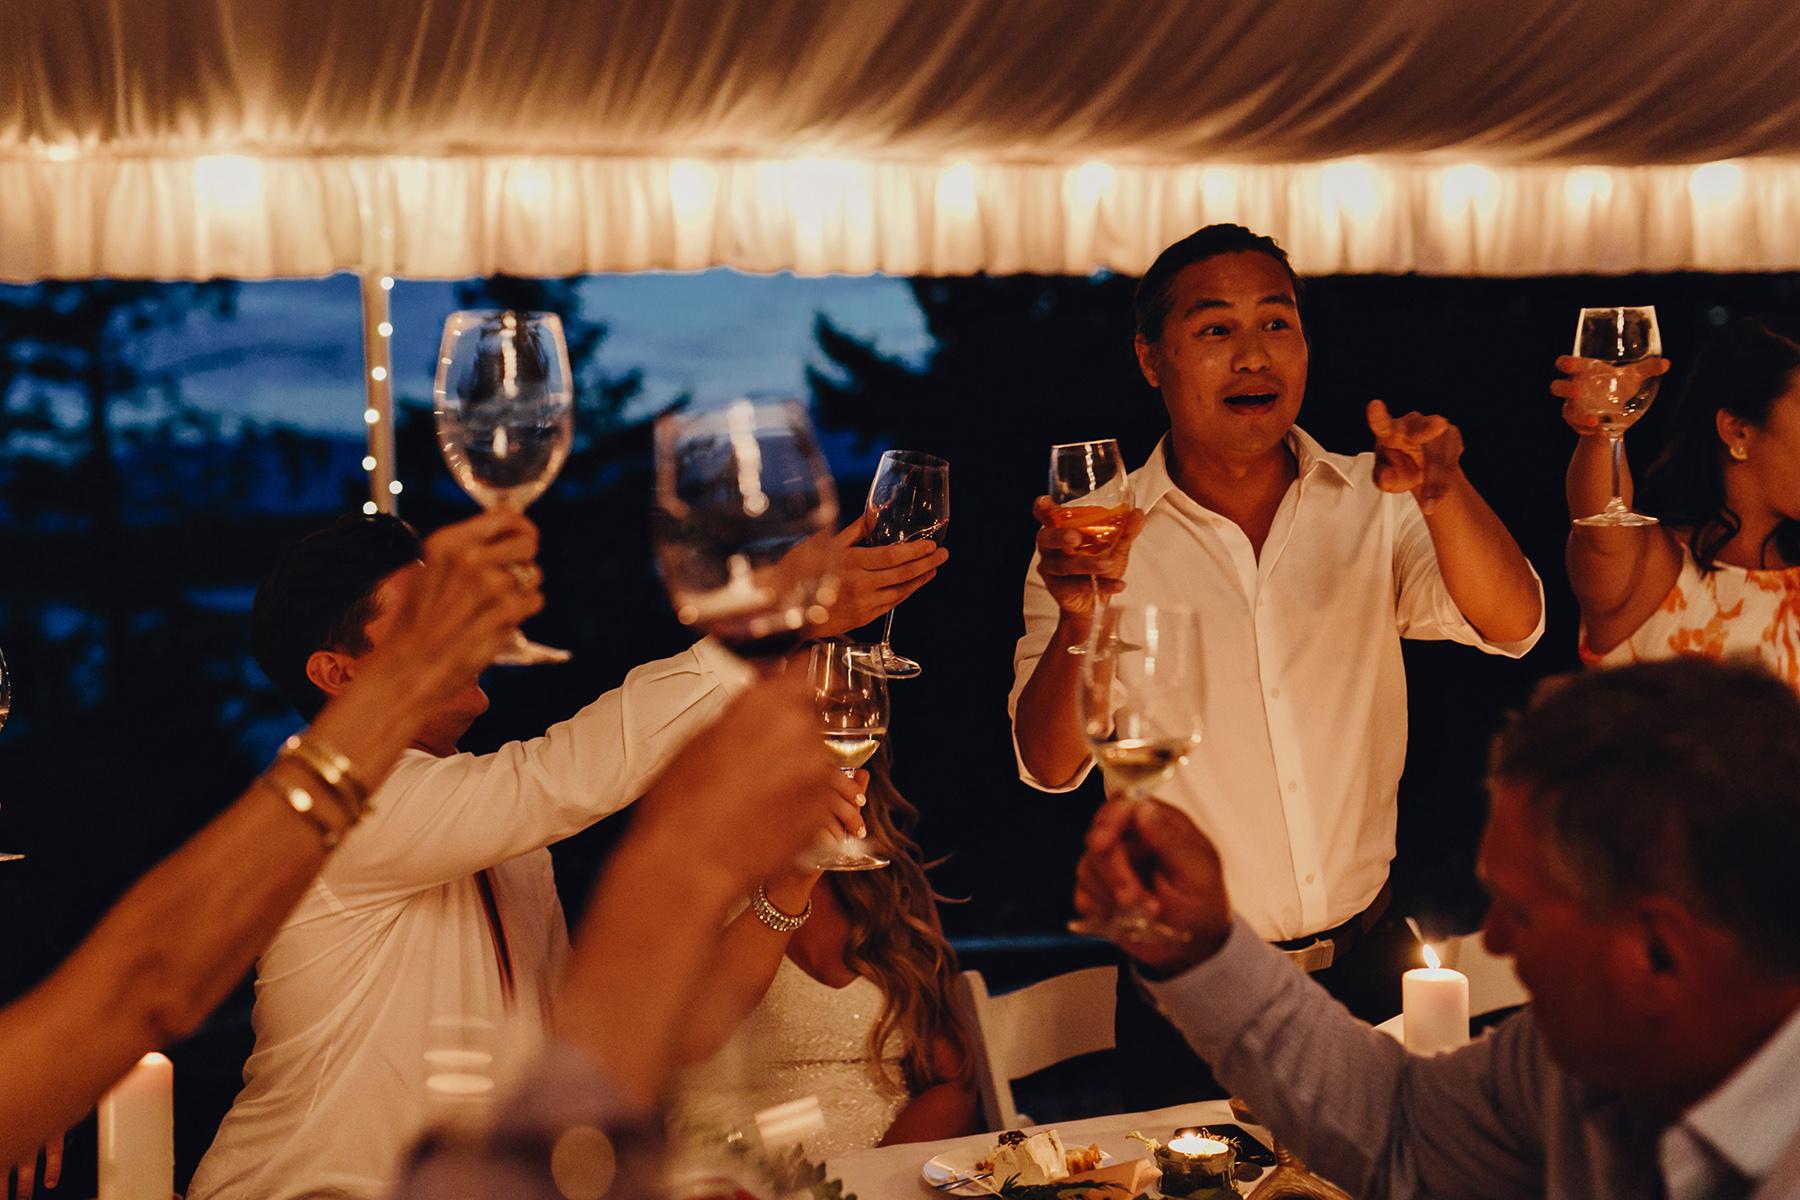 galiano-island-bodega-destination-wedding-0106.JPG